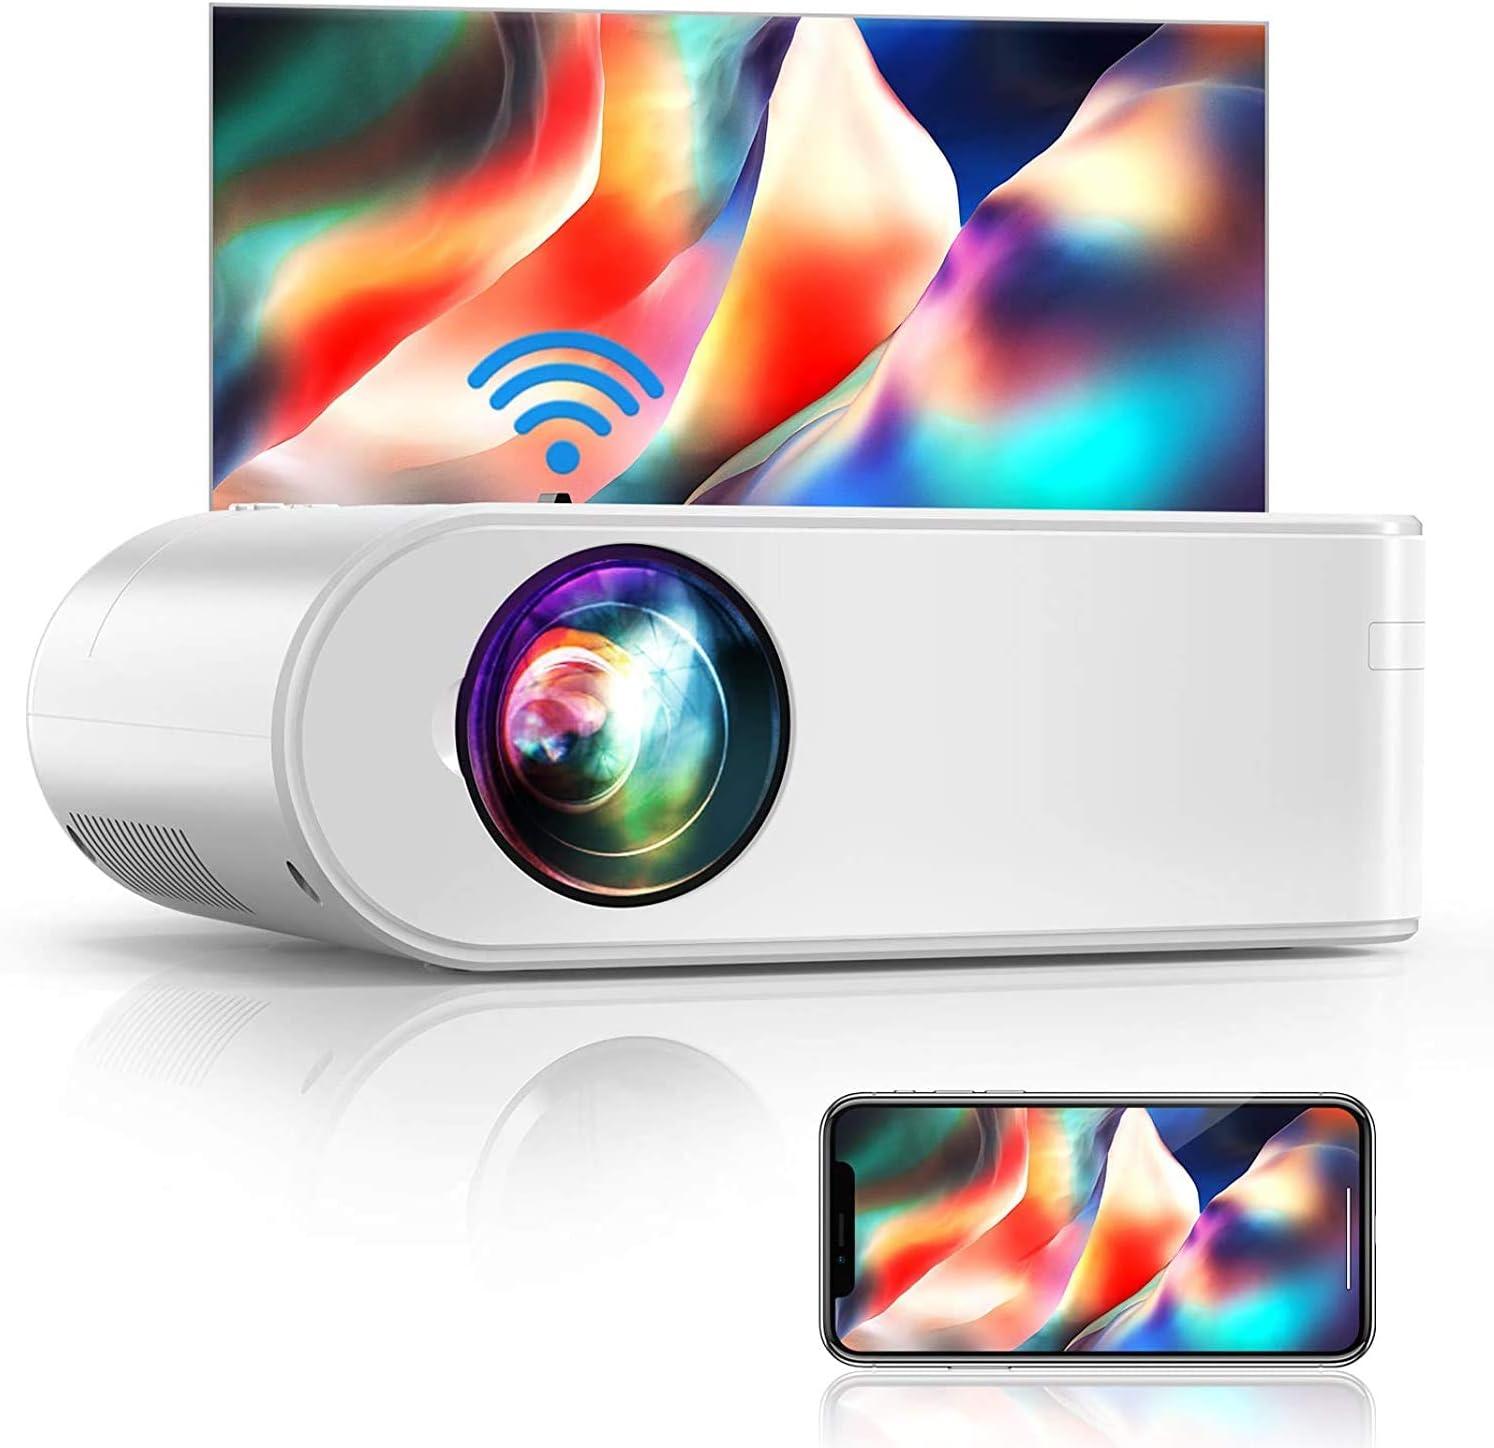 Proyector WiFi, YABER Mini Proyector Portátil 5800 Lúmenes 1080P Full HD[Pantalla de Proyector Incluida], Cine en Casa 200